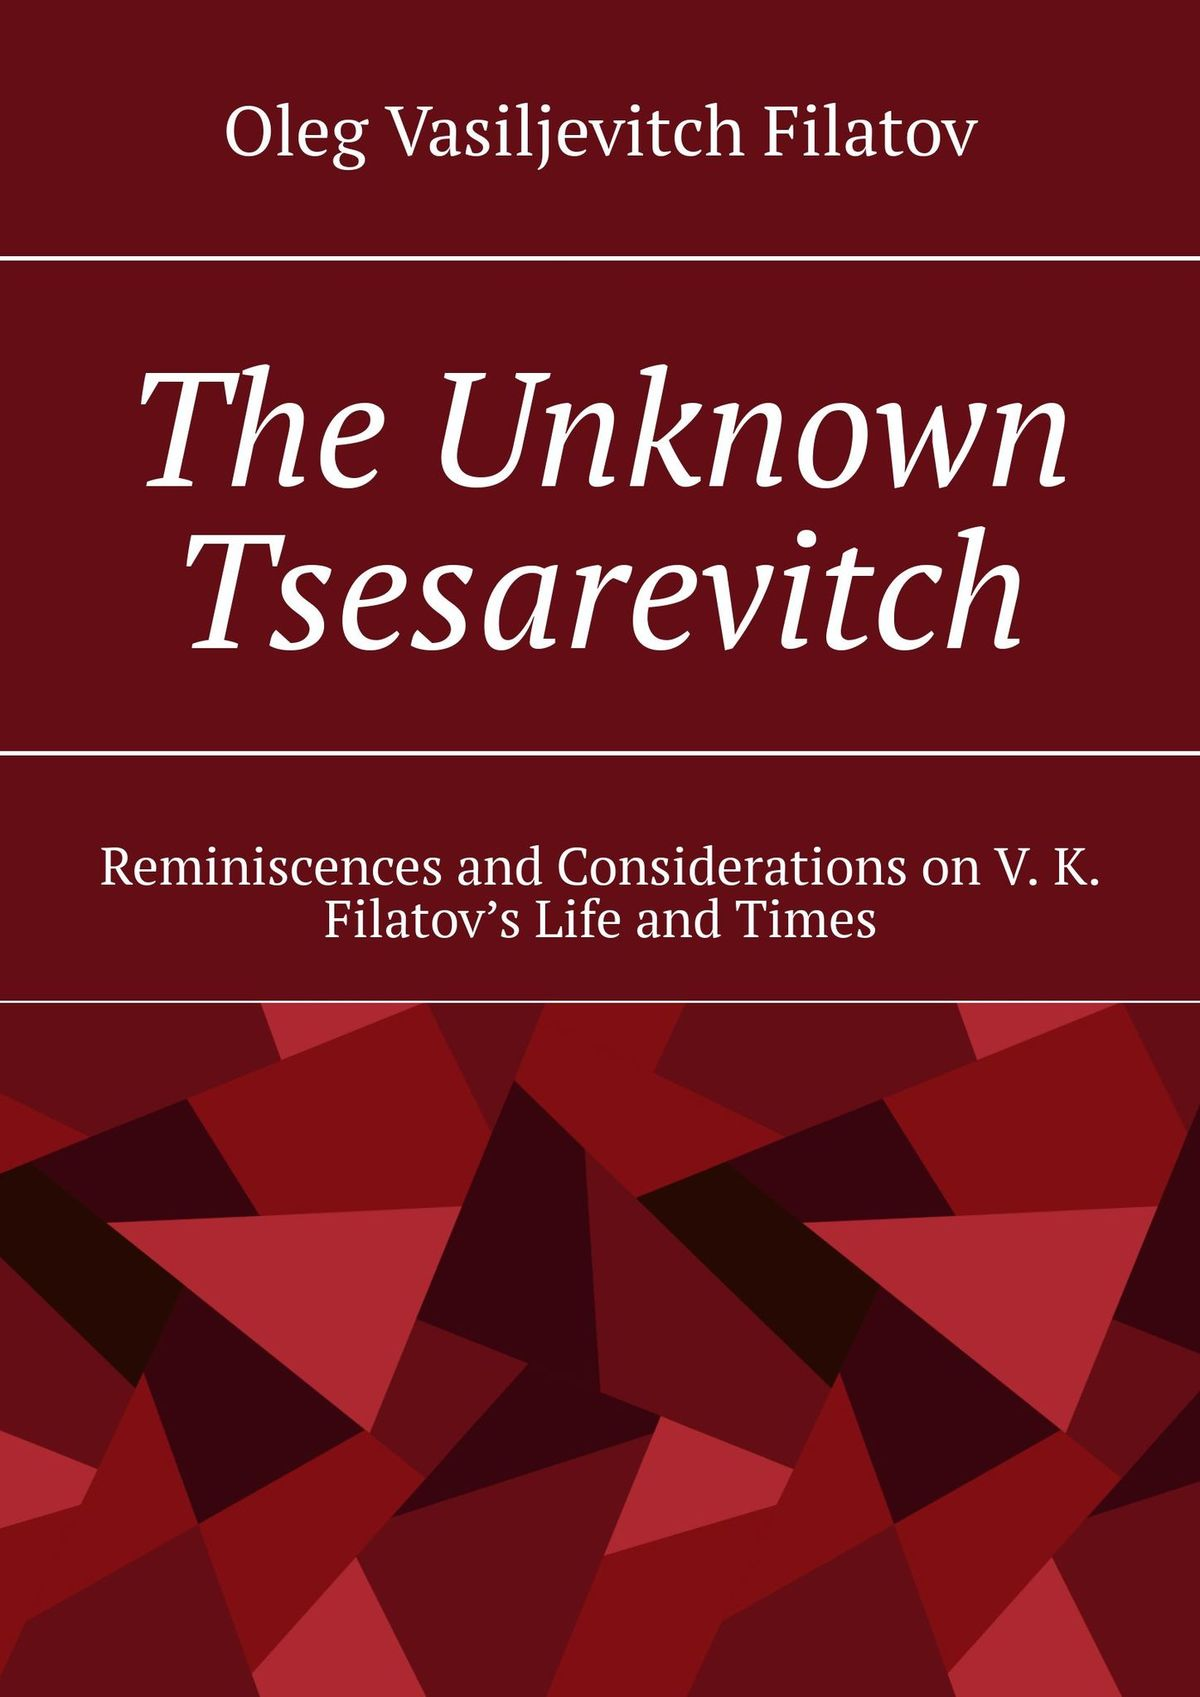 Oleg Vasiljevitch Filatov The Unknown Tsesarevitch. Reminiscences and Considerations on V. K. Filatov's Life and Times jd mcpherson jd mcpherson let the good times roll